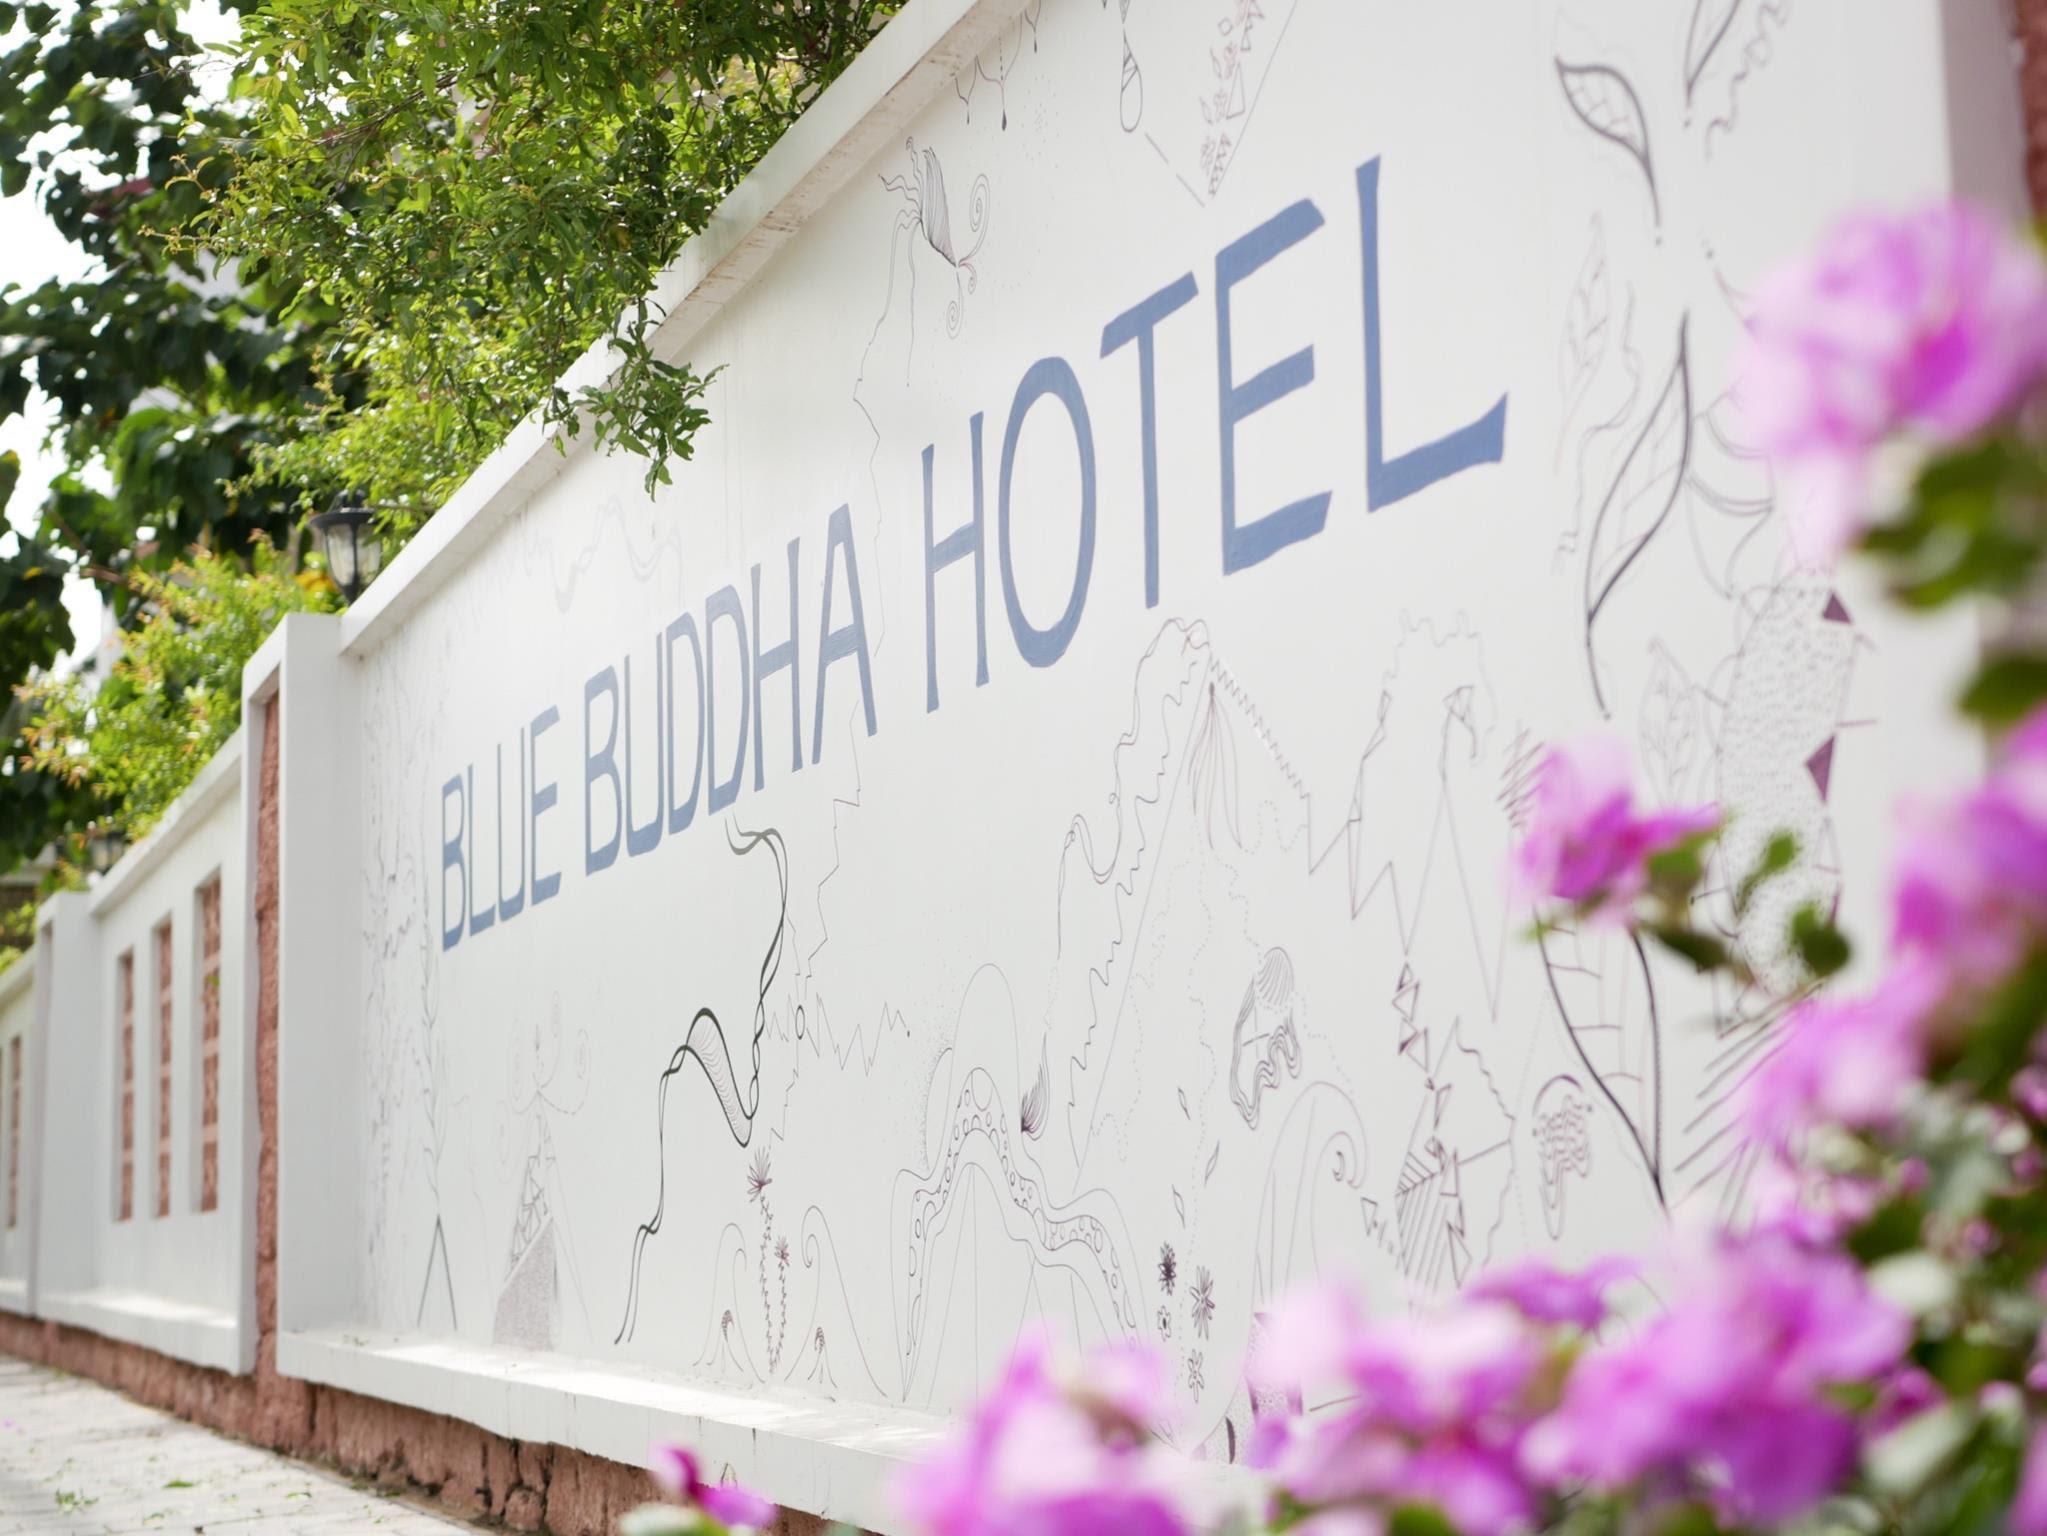 Discount Blue Buddha Hotel